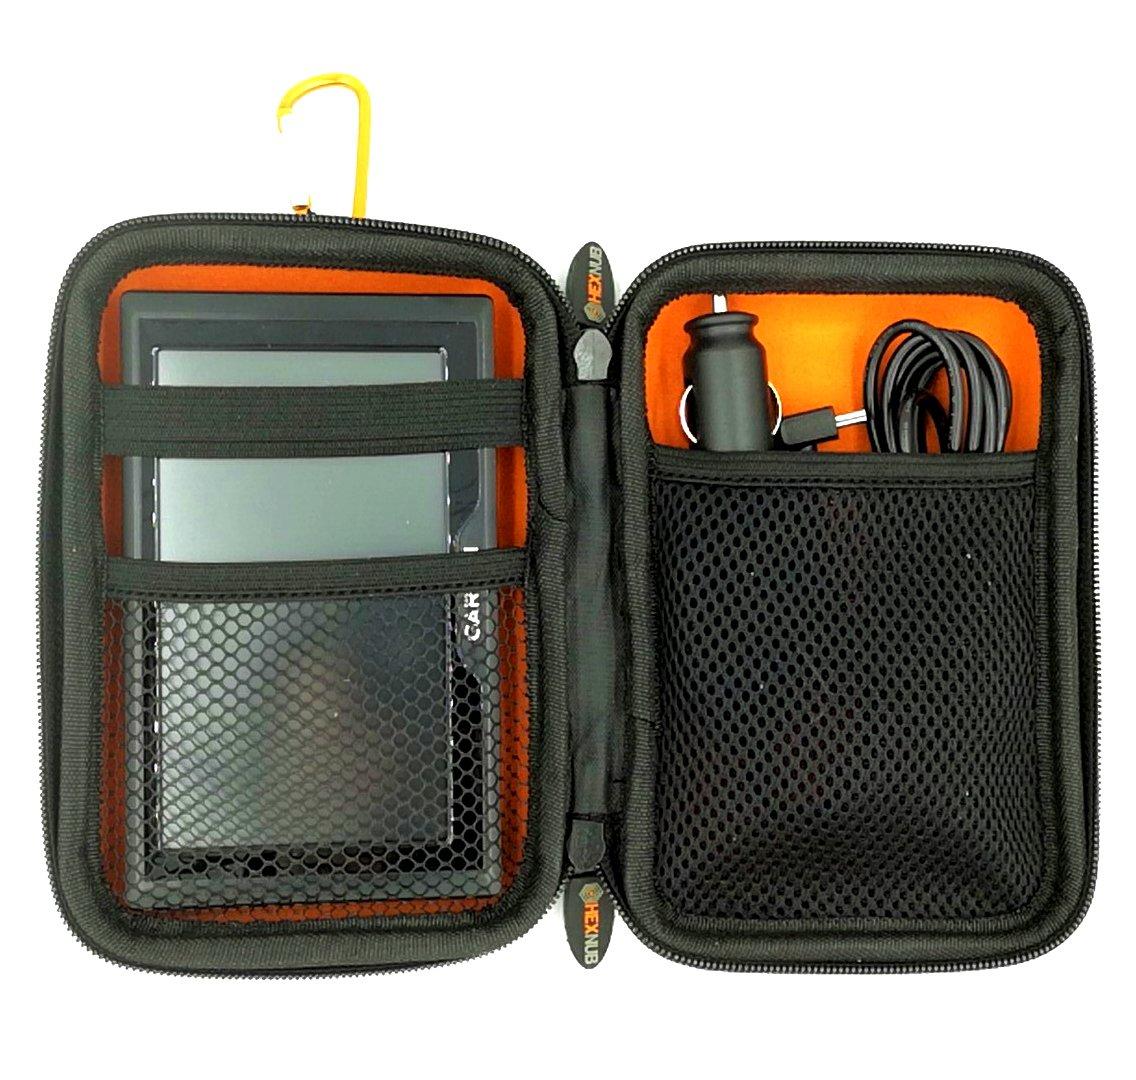 Garmin Sat Nav Carry Case se Adapta a Todas Las Unidades Garmin Drive de 5 Pulgadas 51LMT-S D 40LM DriveSmart 50LM Jugo 345LM 395LM Dezl 580 LMT-D Nuvi 57LM Naranja//Negro